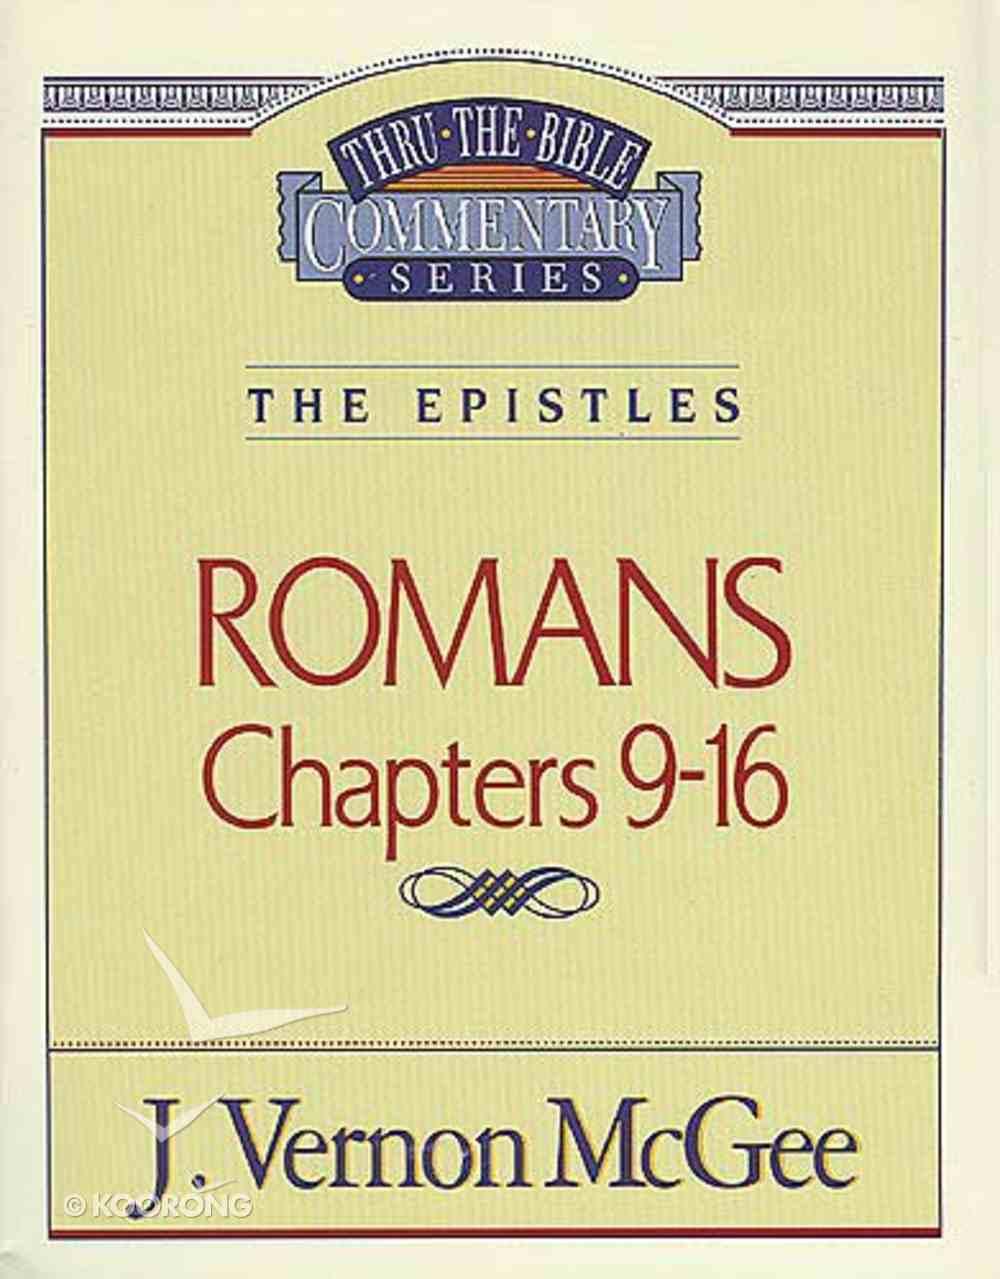 Thru the Bible NT #43: Romans (Volume 2) (#43 in Thru The Bible New Testament Series) Paperback